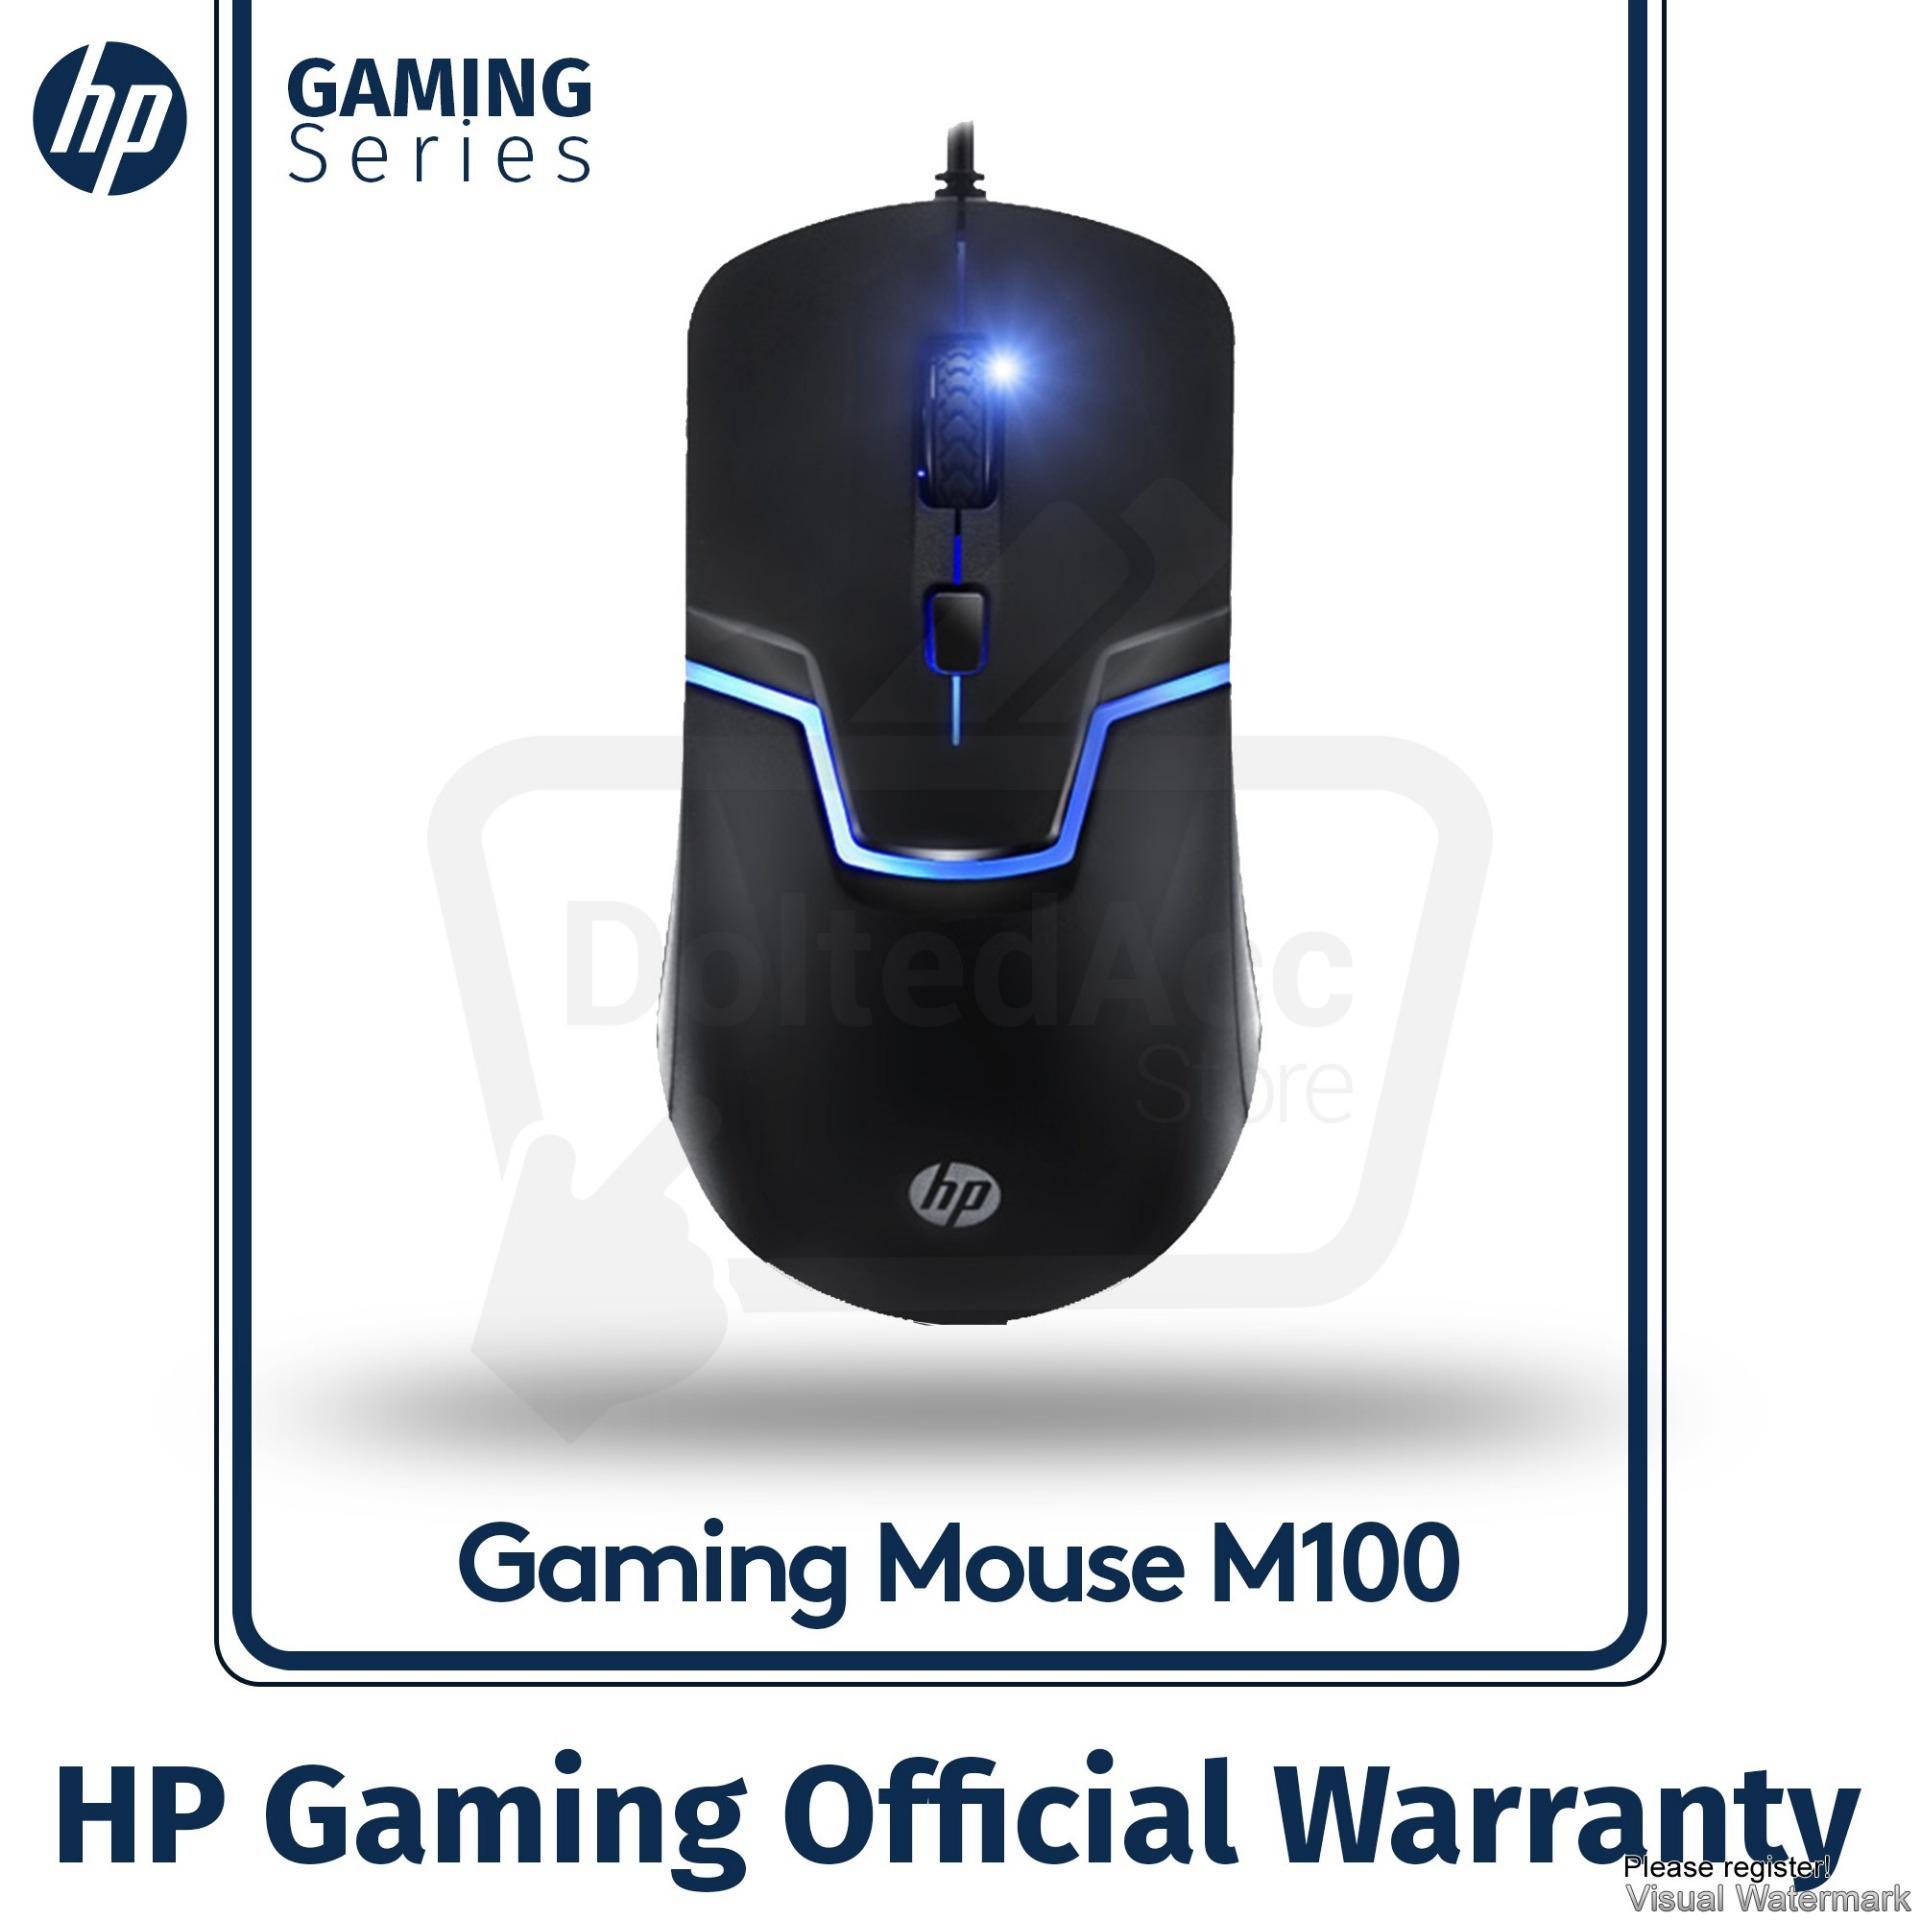 Jual Aksesoris Komputer Terlengkap Murah Keyboard Votre Kb2308 Usb Hp G1100 Gaming Office Mouse Hitam